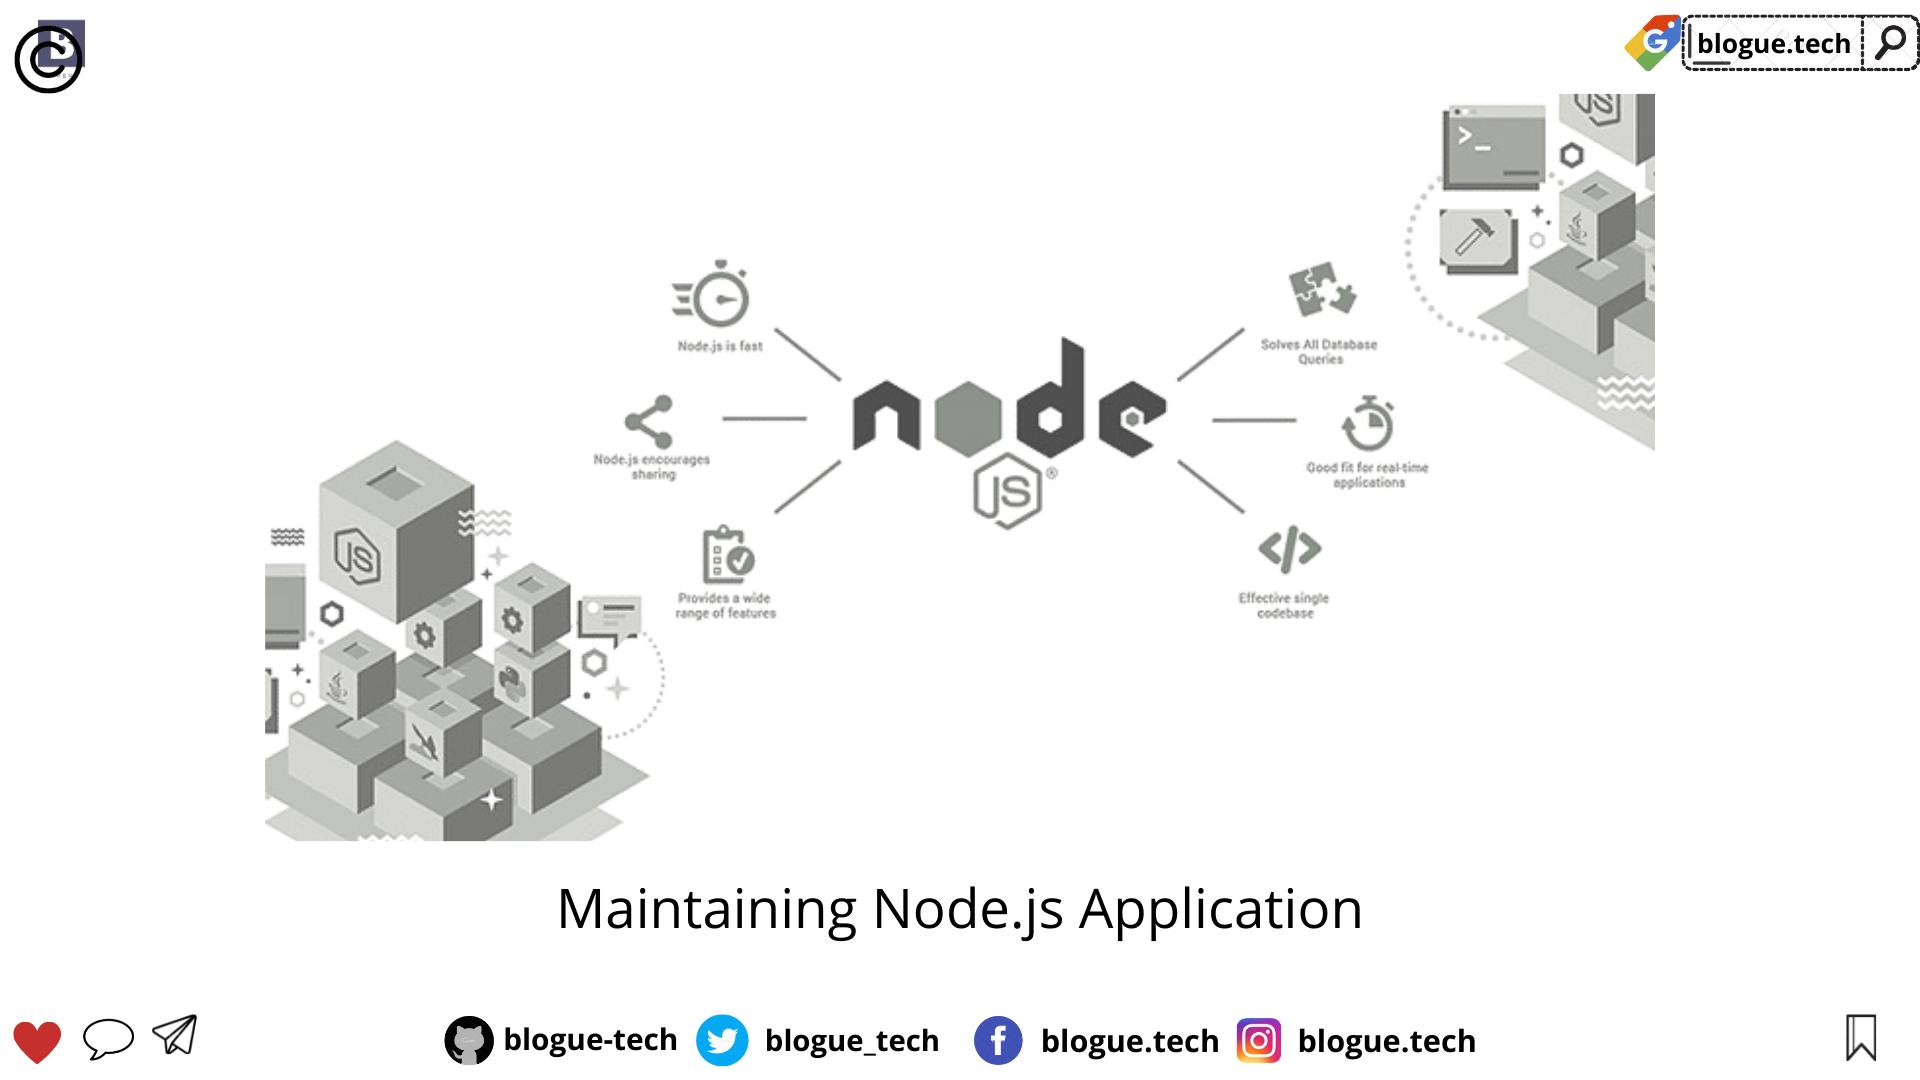 Maintaining Node.js Application